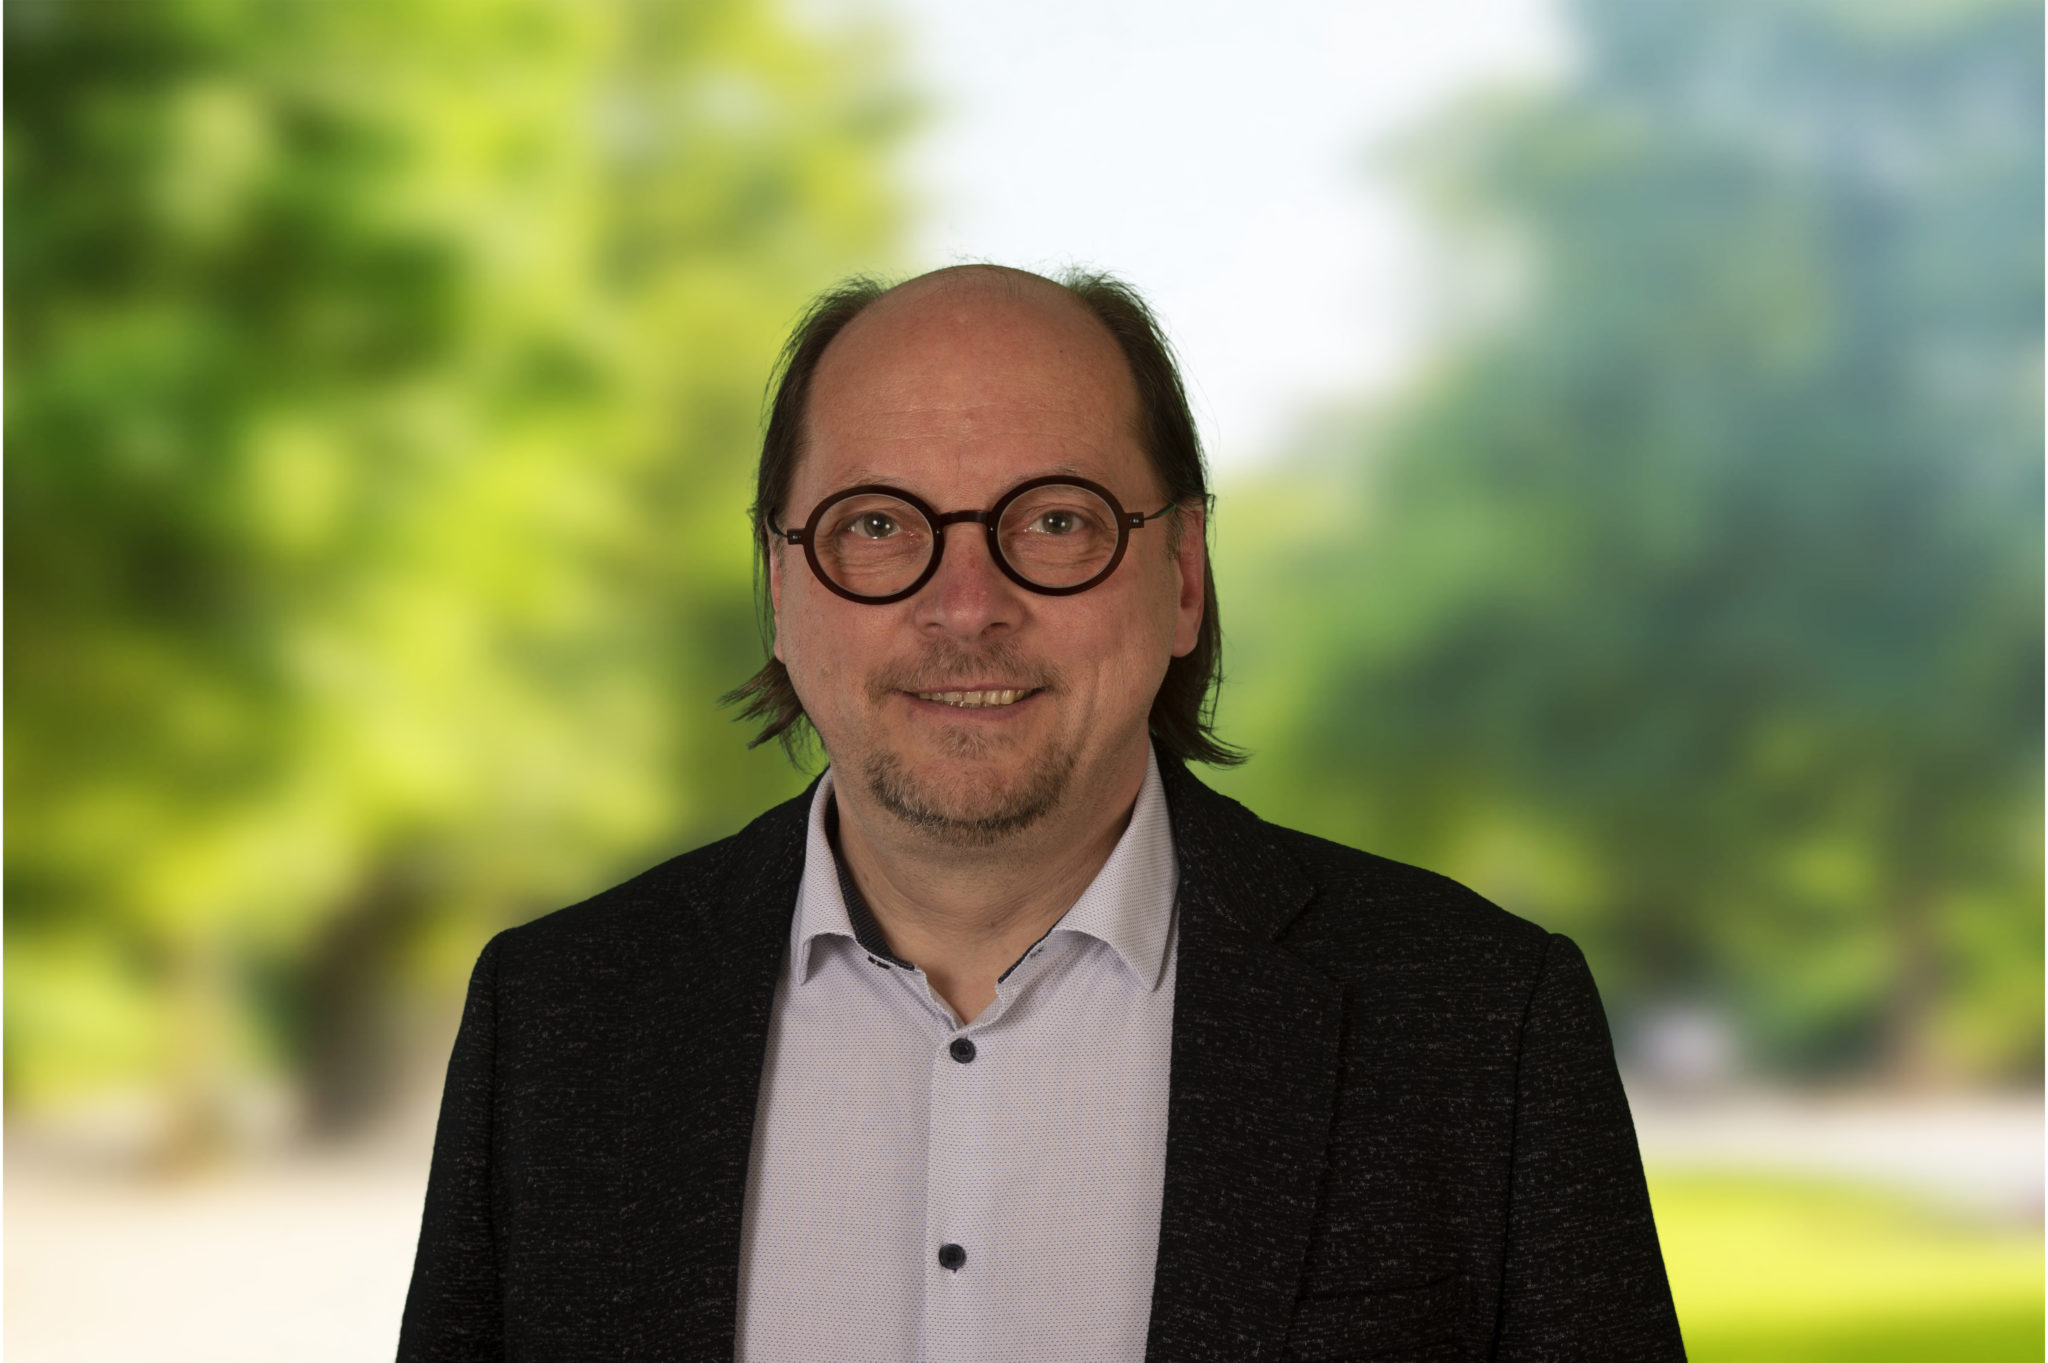 Jean-Luc Révelard